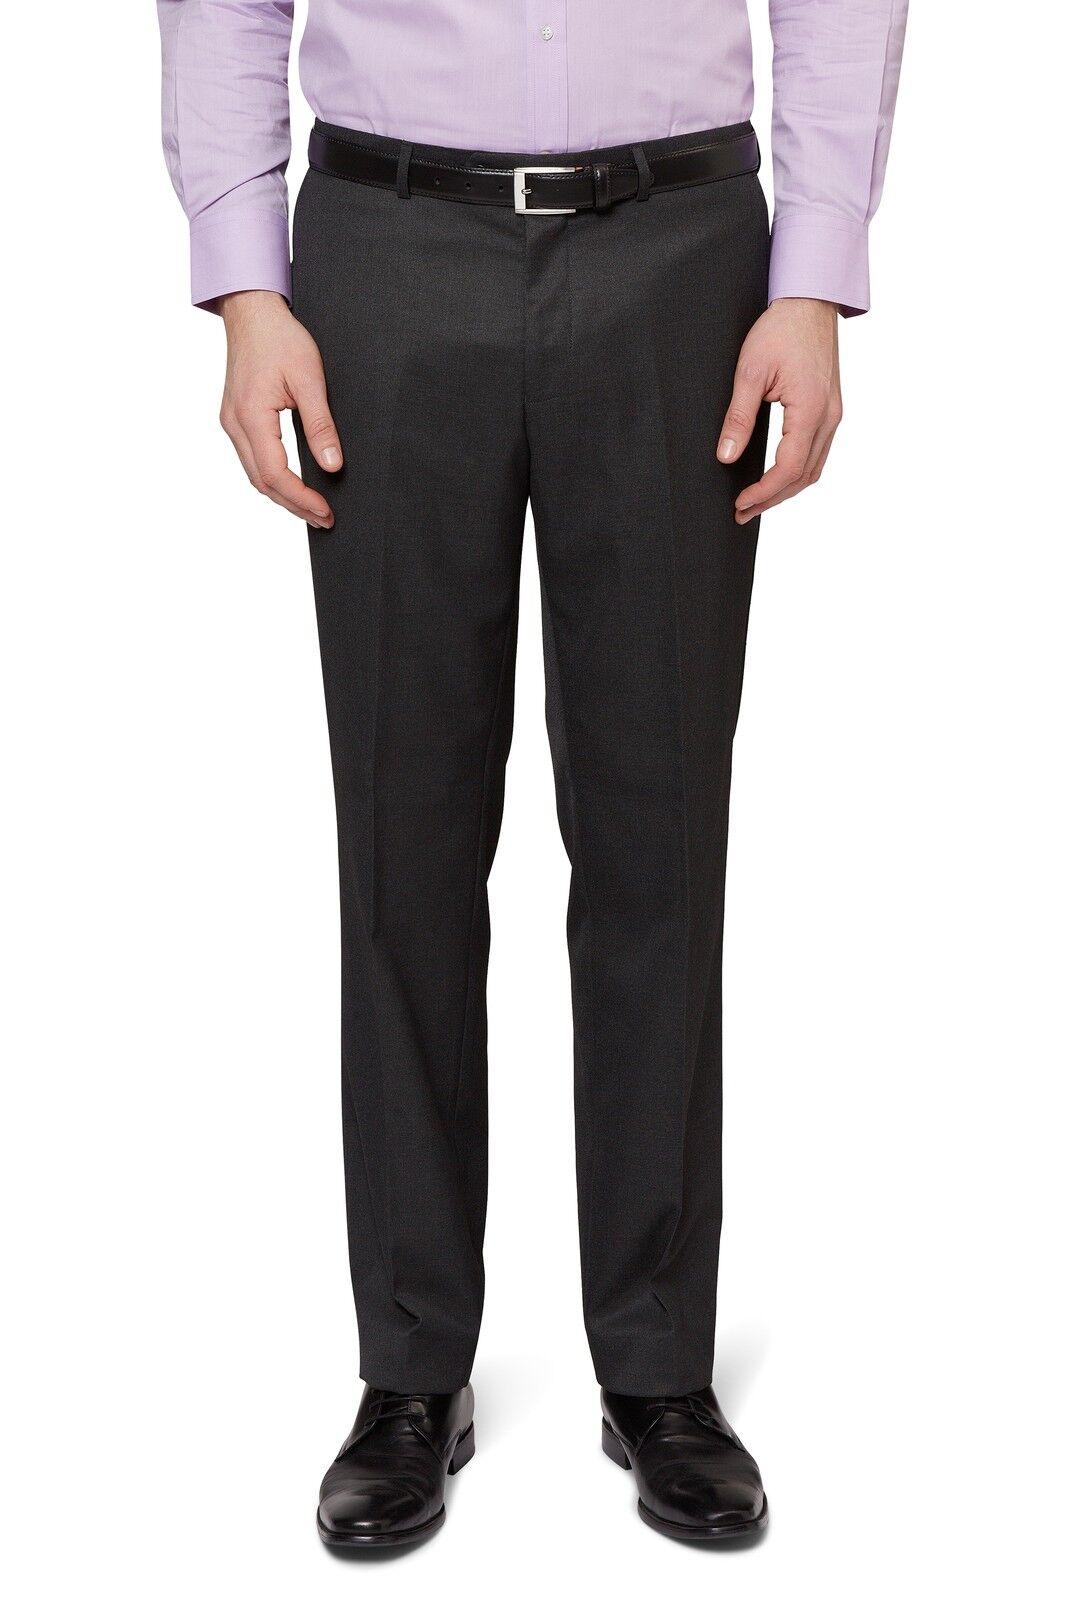 Moss Esq. Mens Grey Suit Trousers Regular Fit Flat Front Formal Charcoal Pants